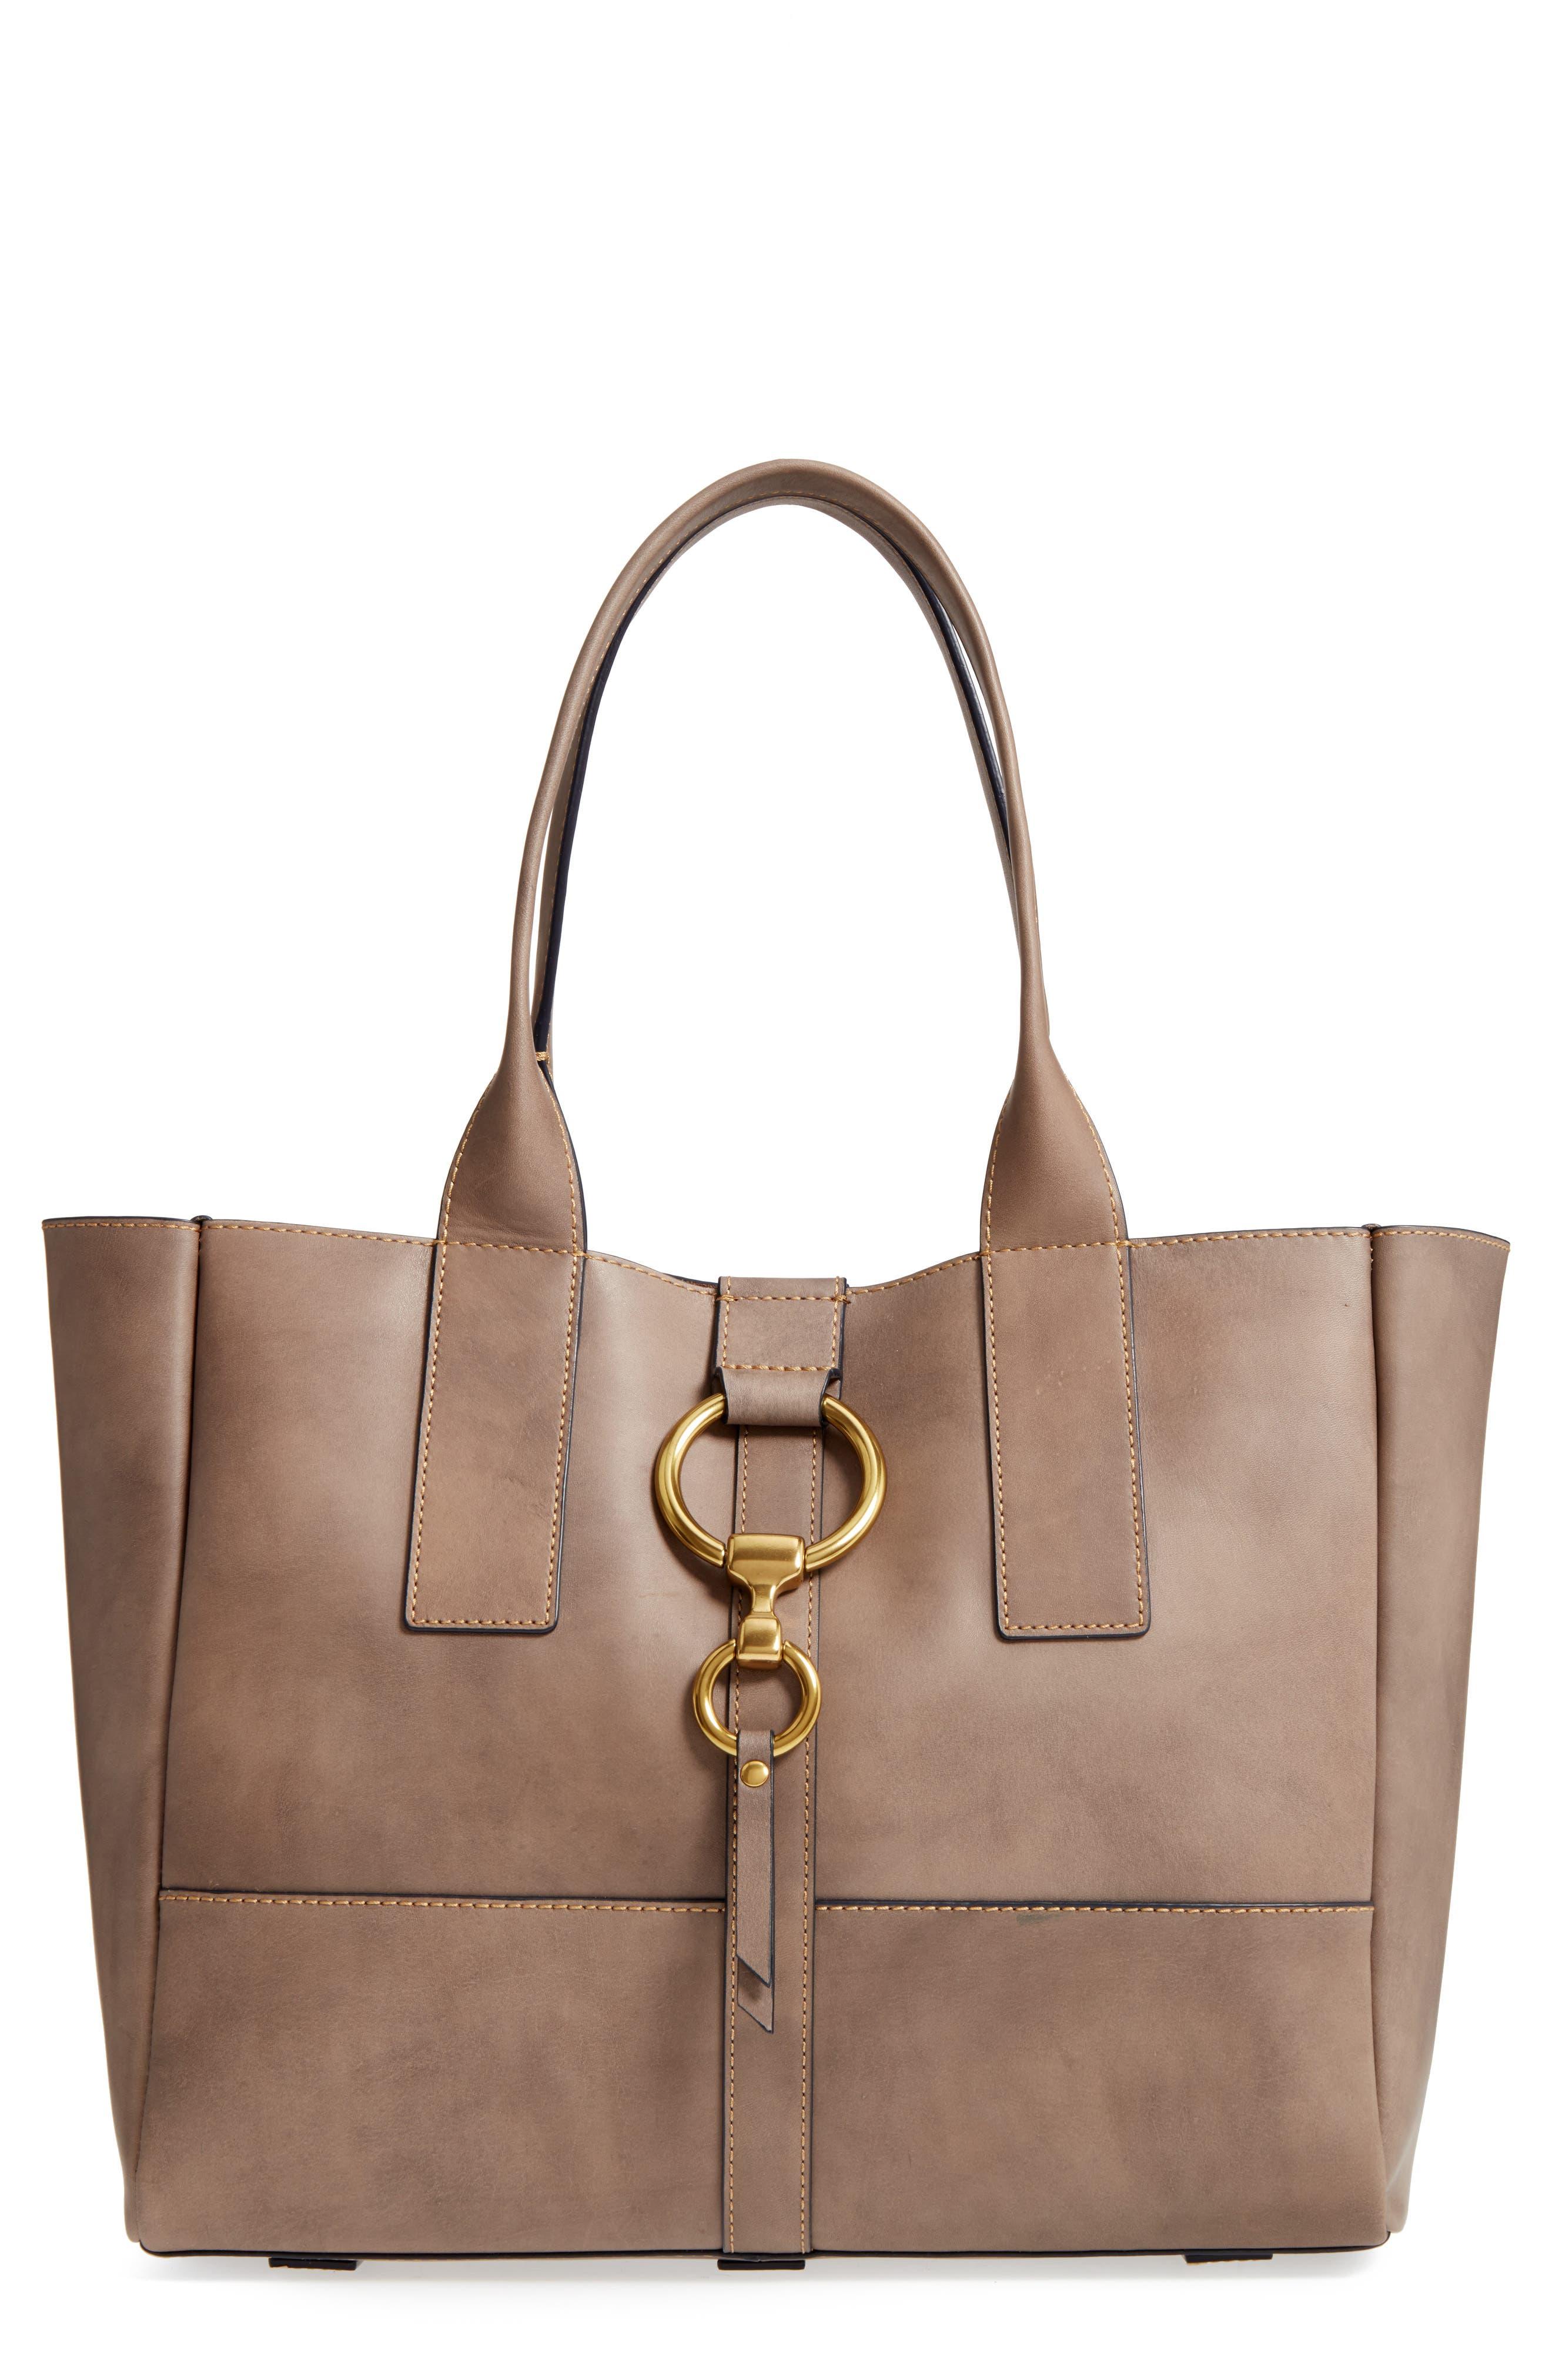 Ilana Harness Leather Shopper,                             Main thumbnail 1, color,                             030